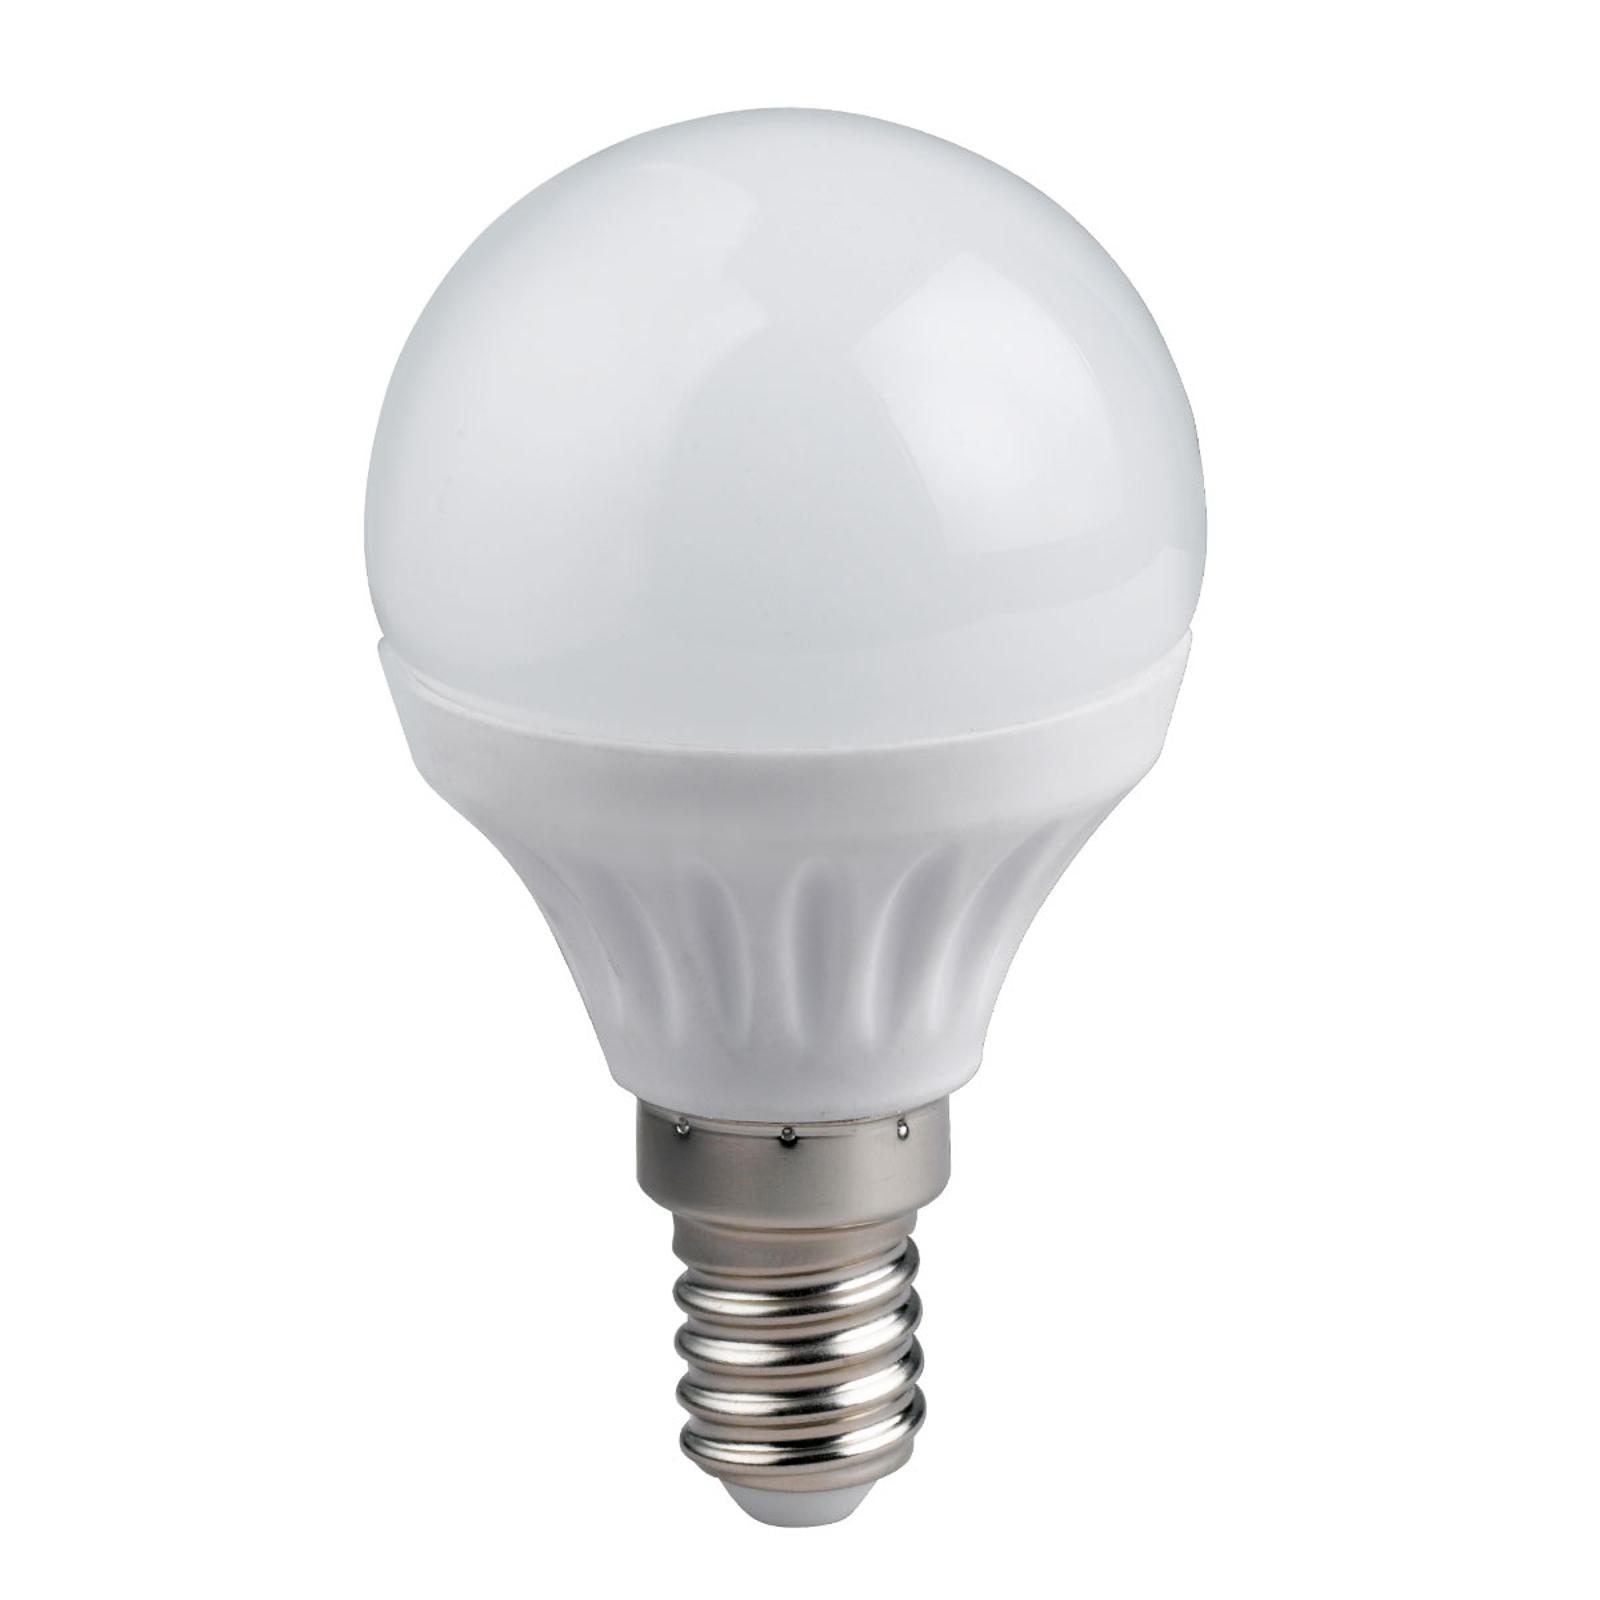 LED-dropplampa E14 5W 3000K dimbar